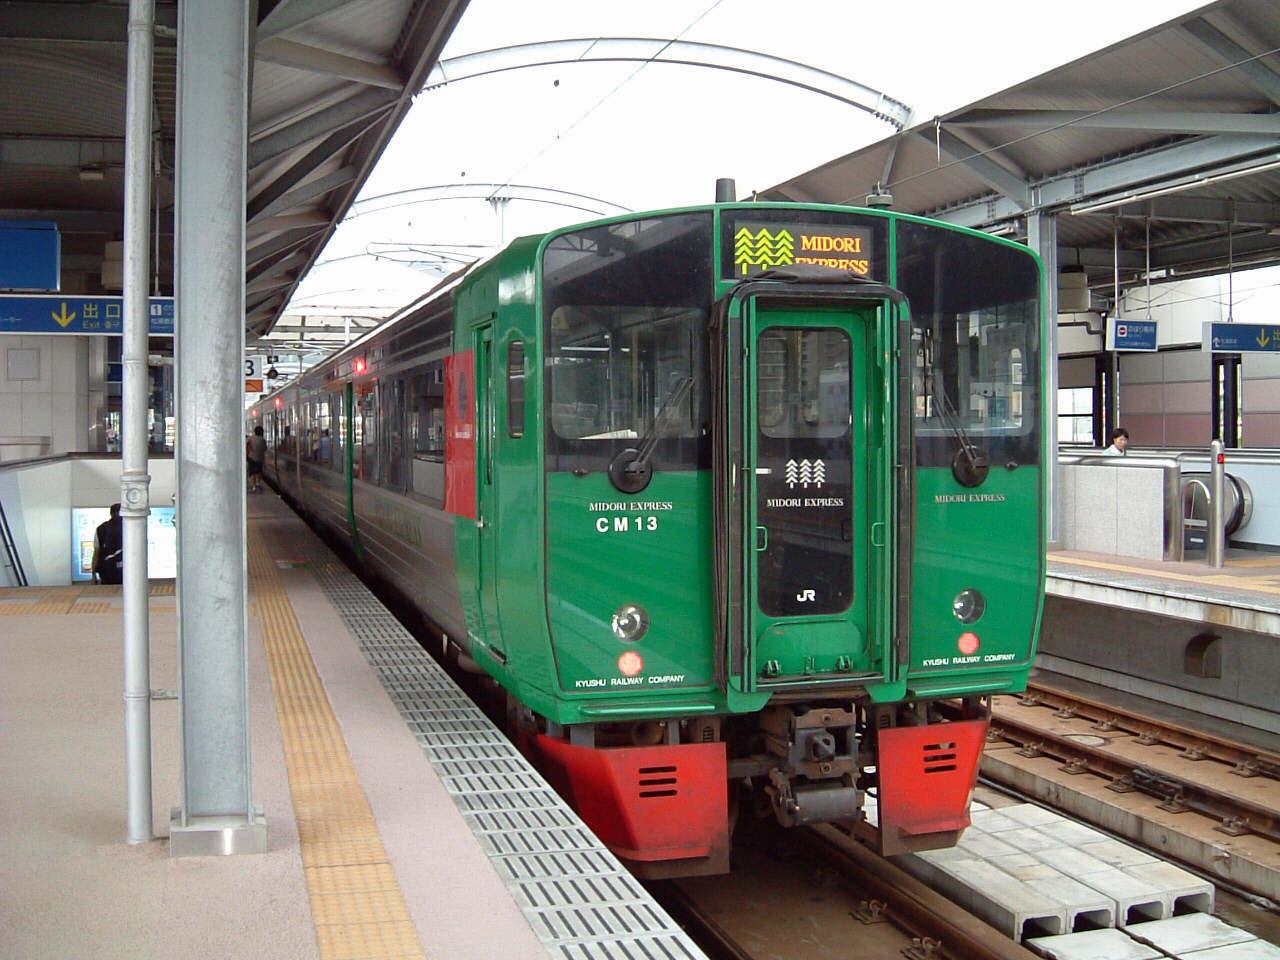 Thsc782_midori.jpg